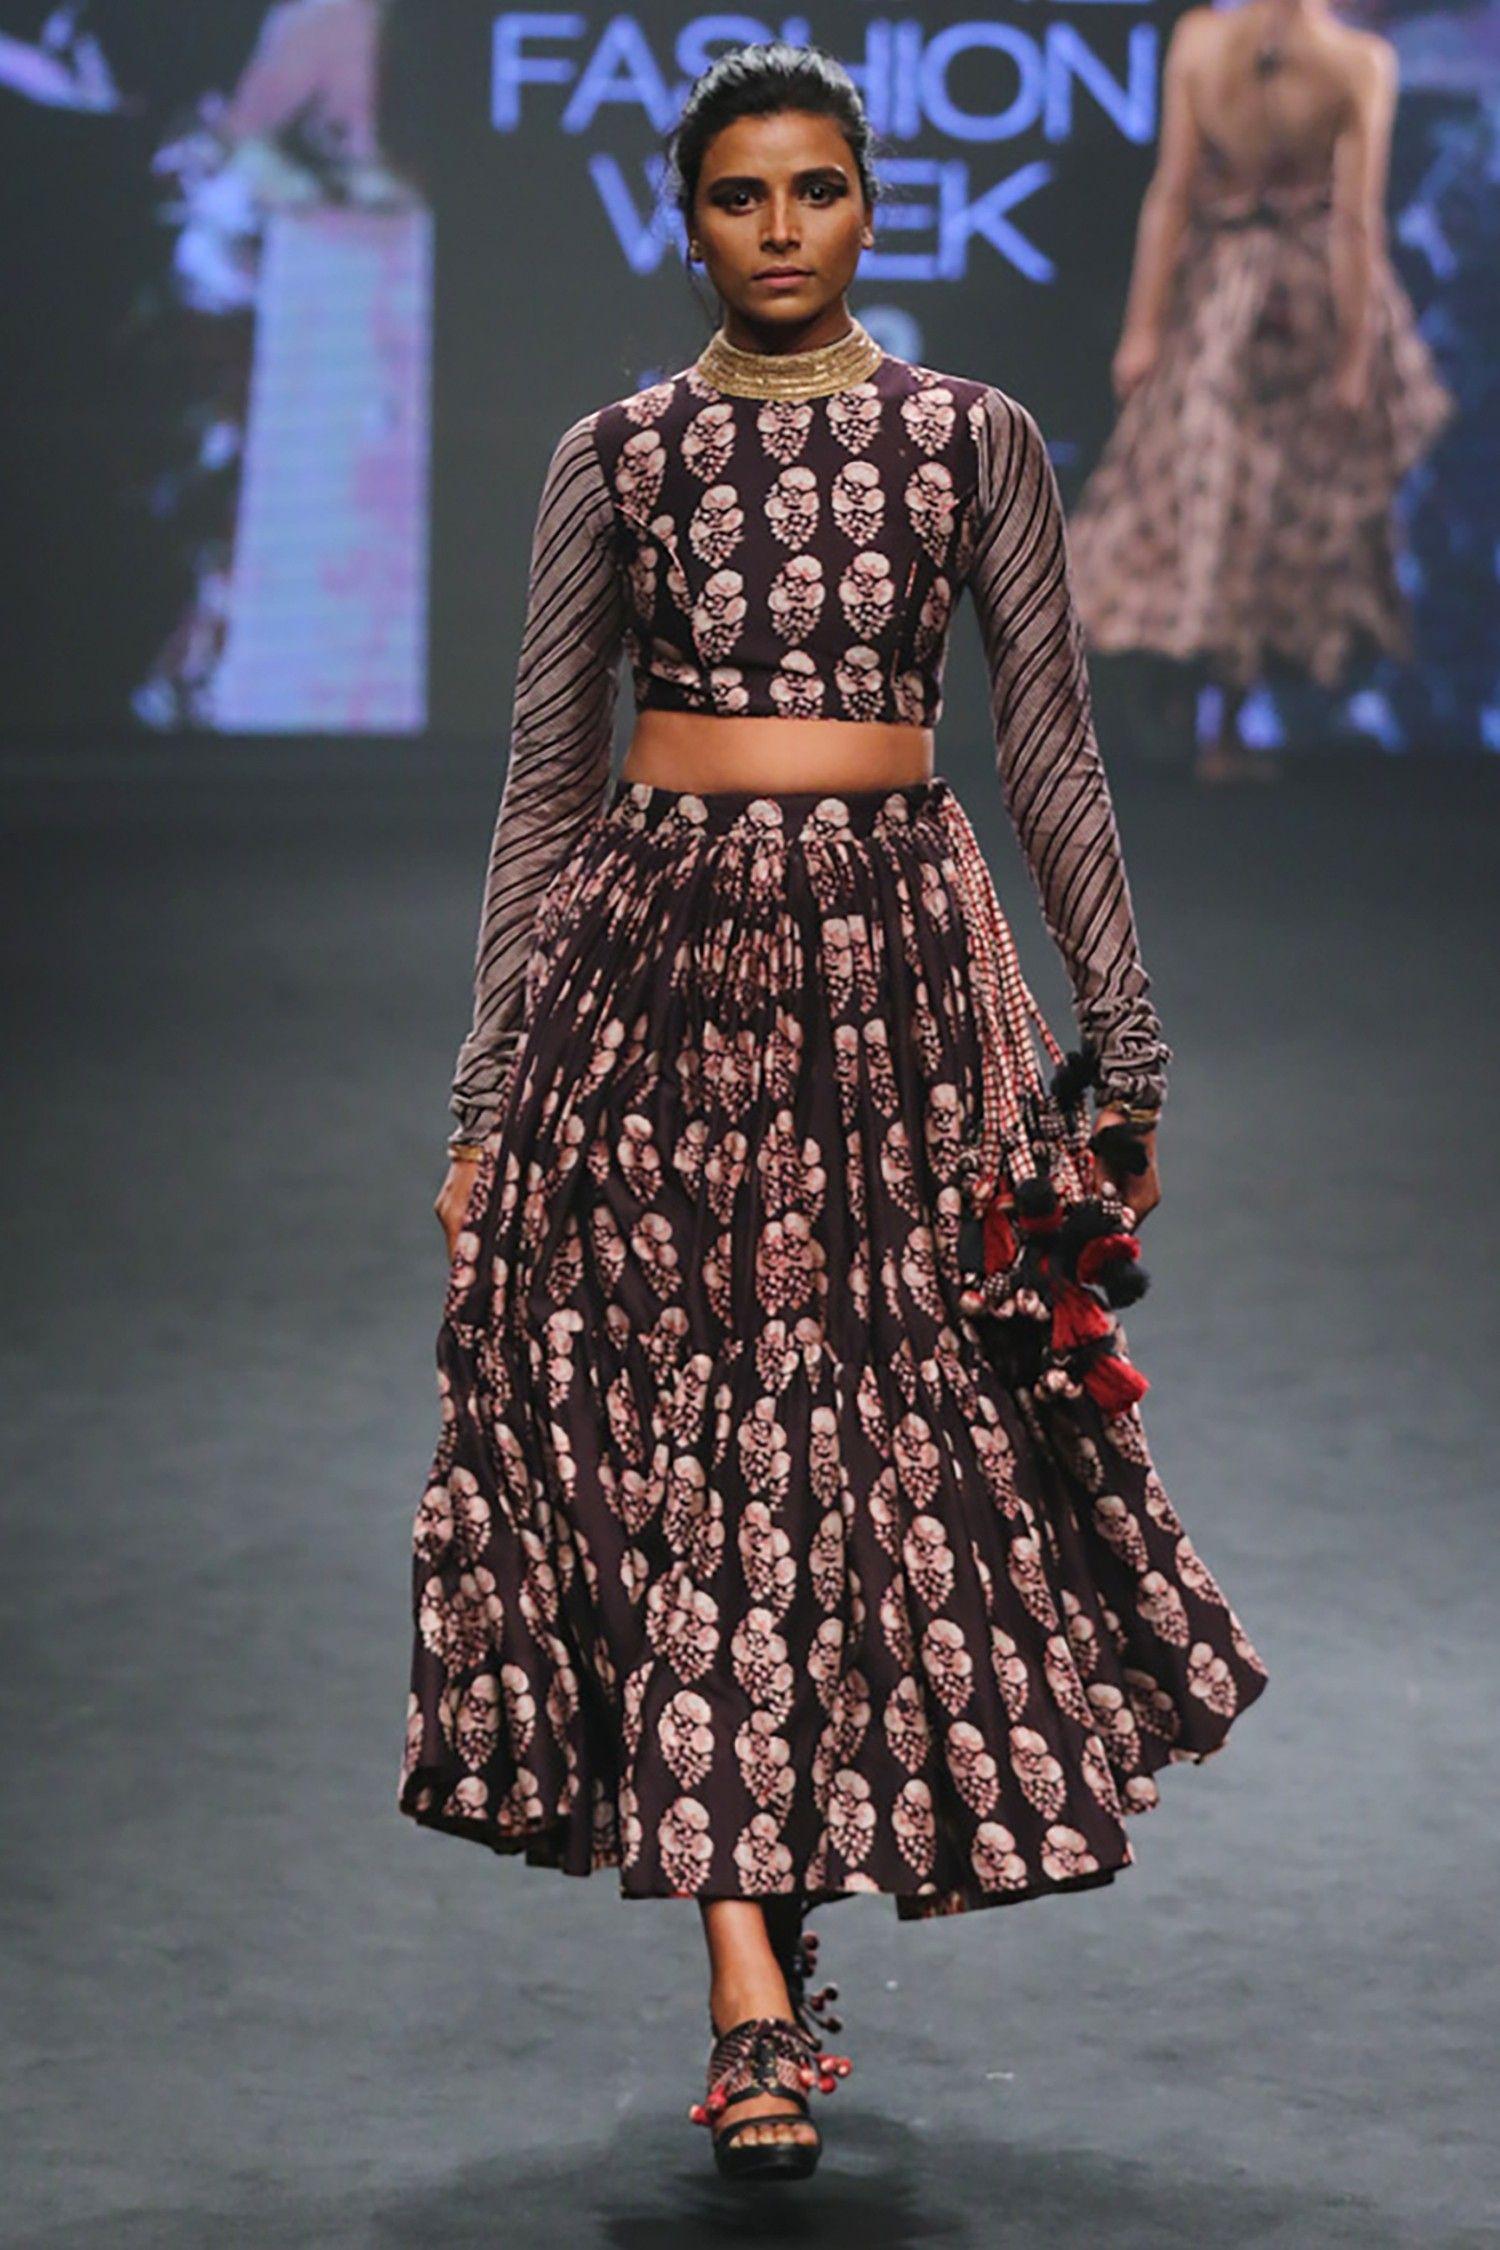 Printed croptop with skirt Punit Balana Designers